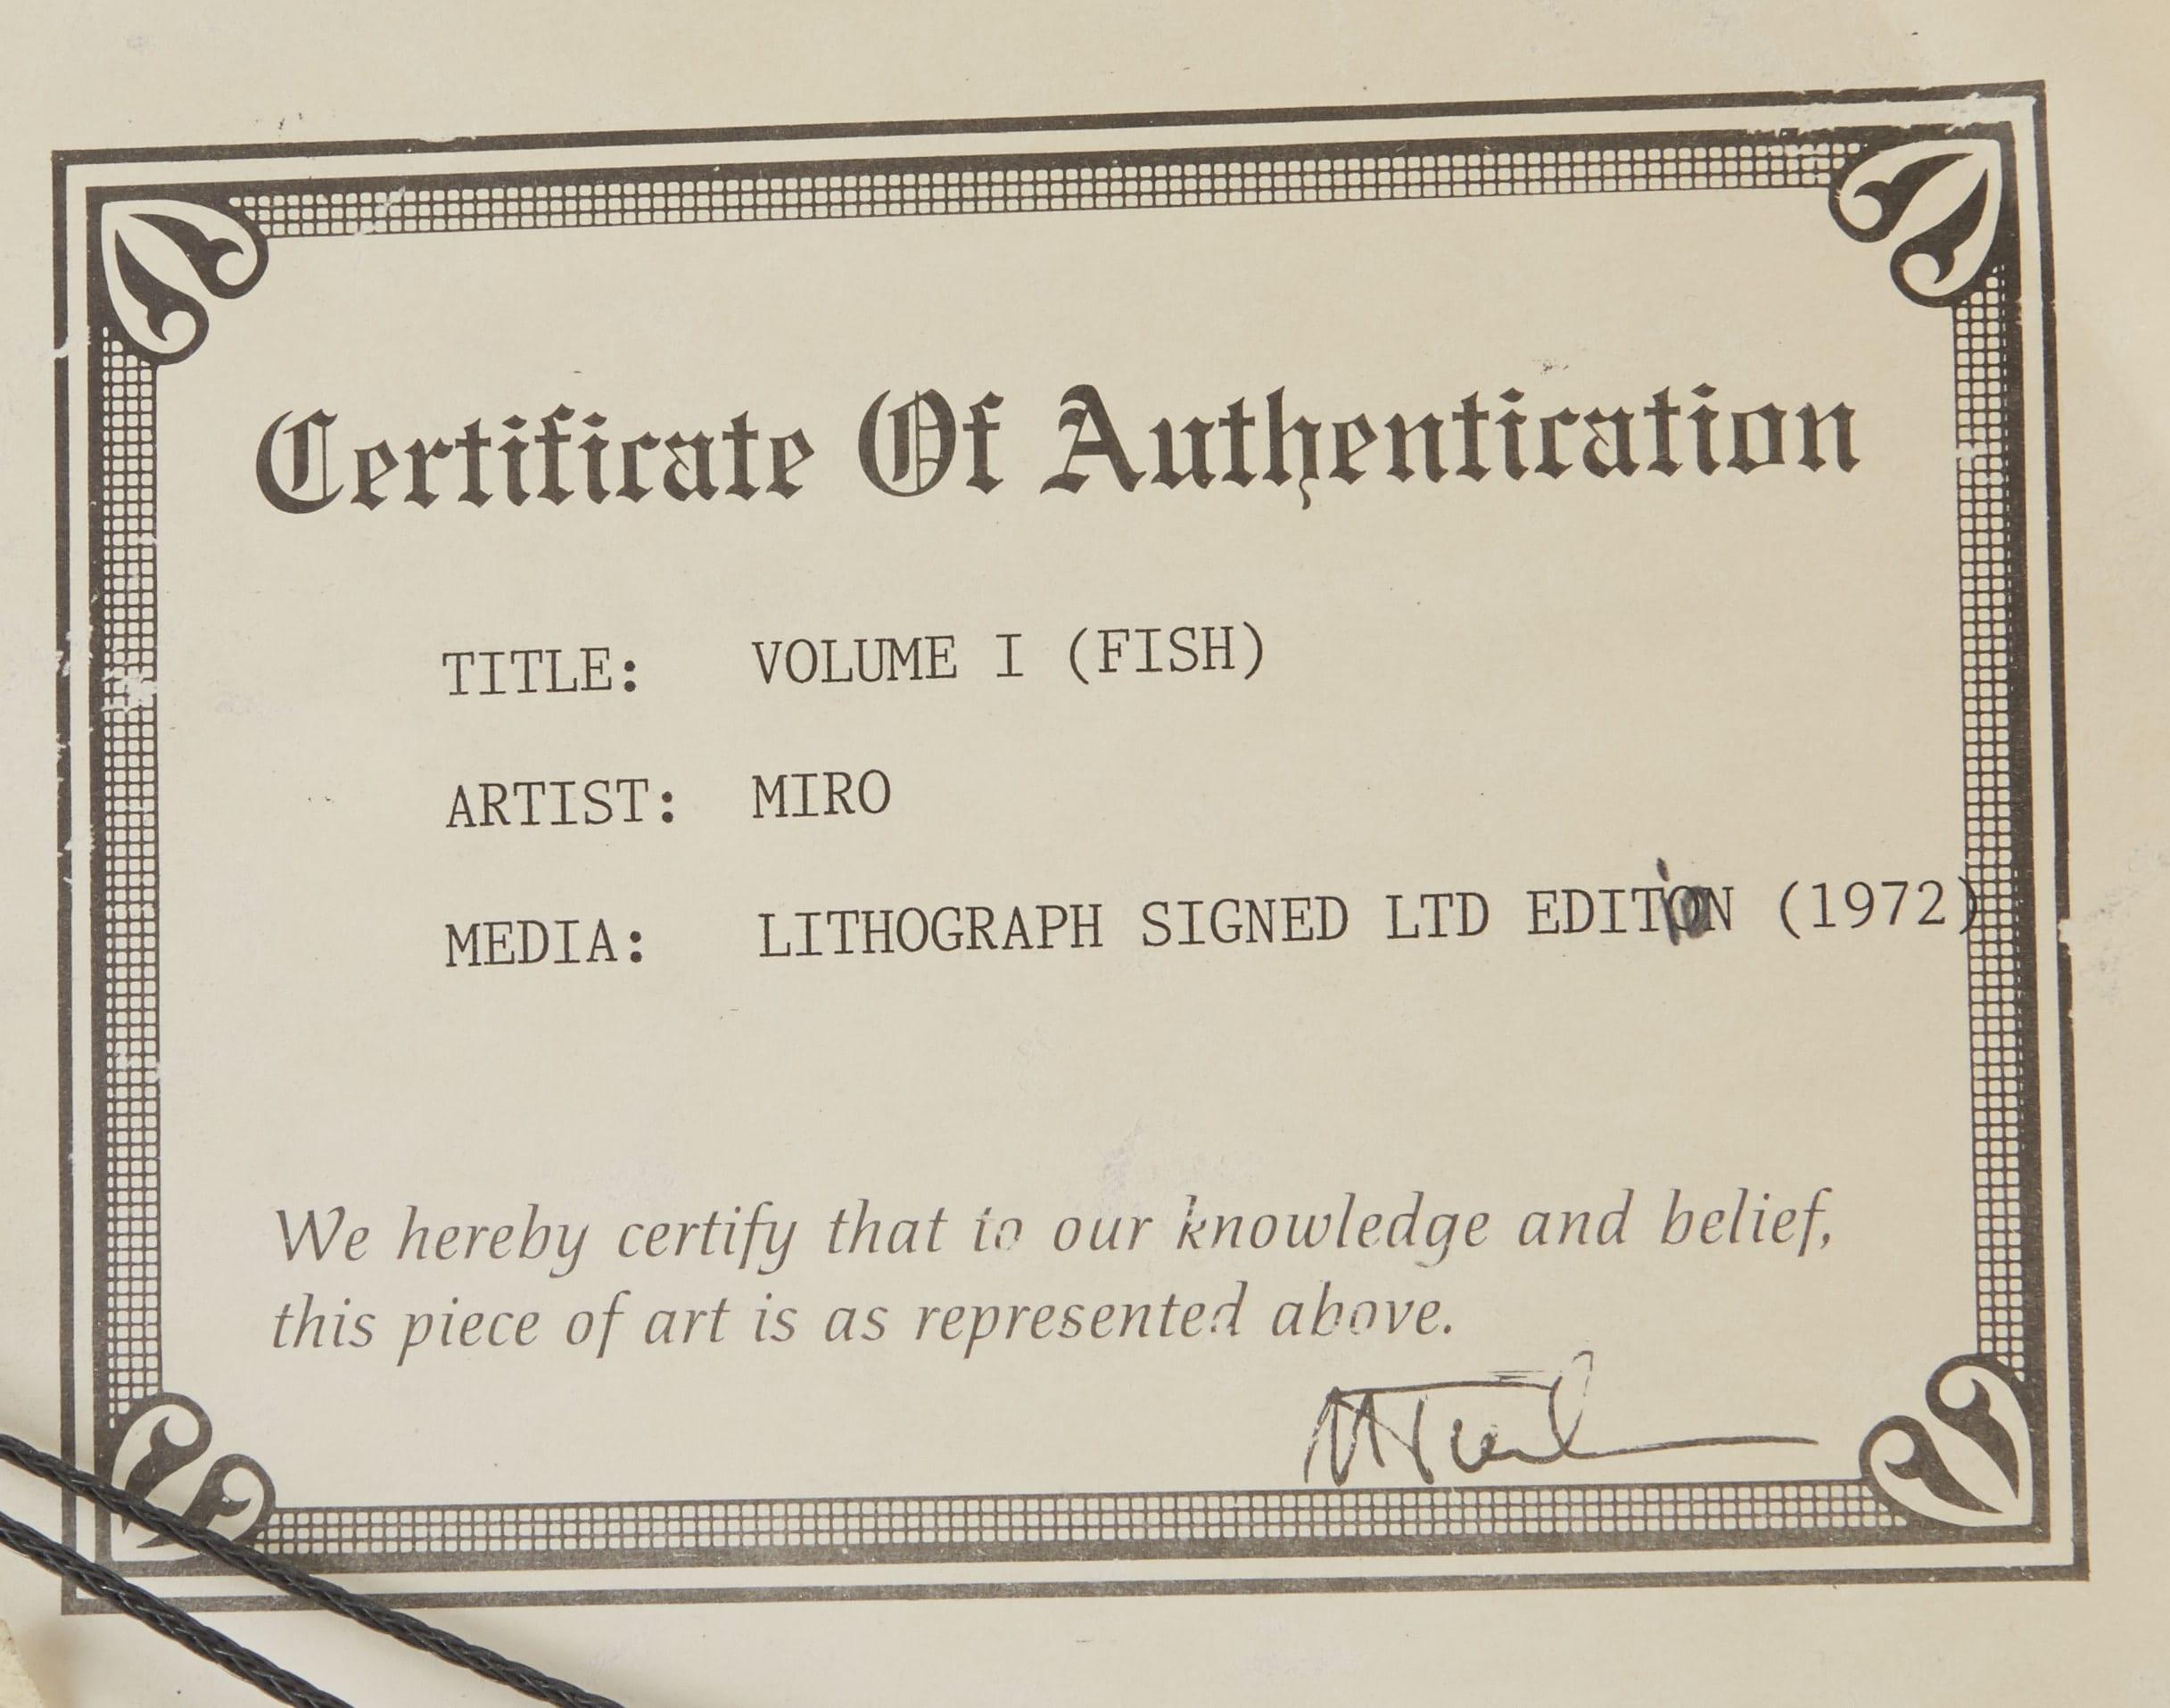 Lot 241: Joan Miro Volume 1 Fish Lithograph